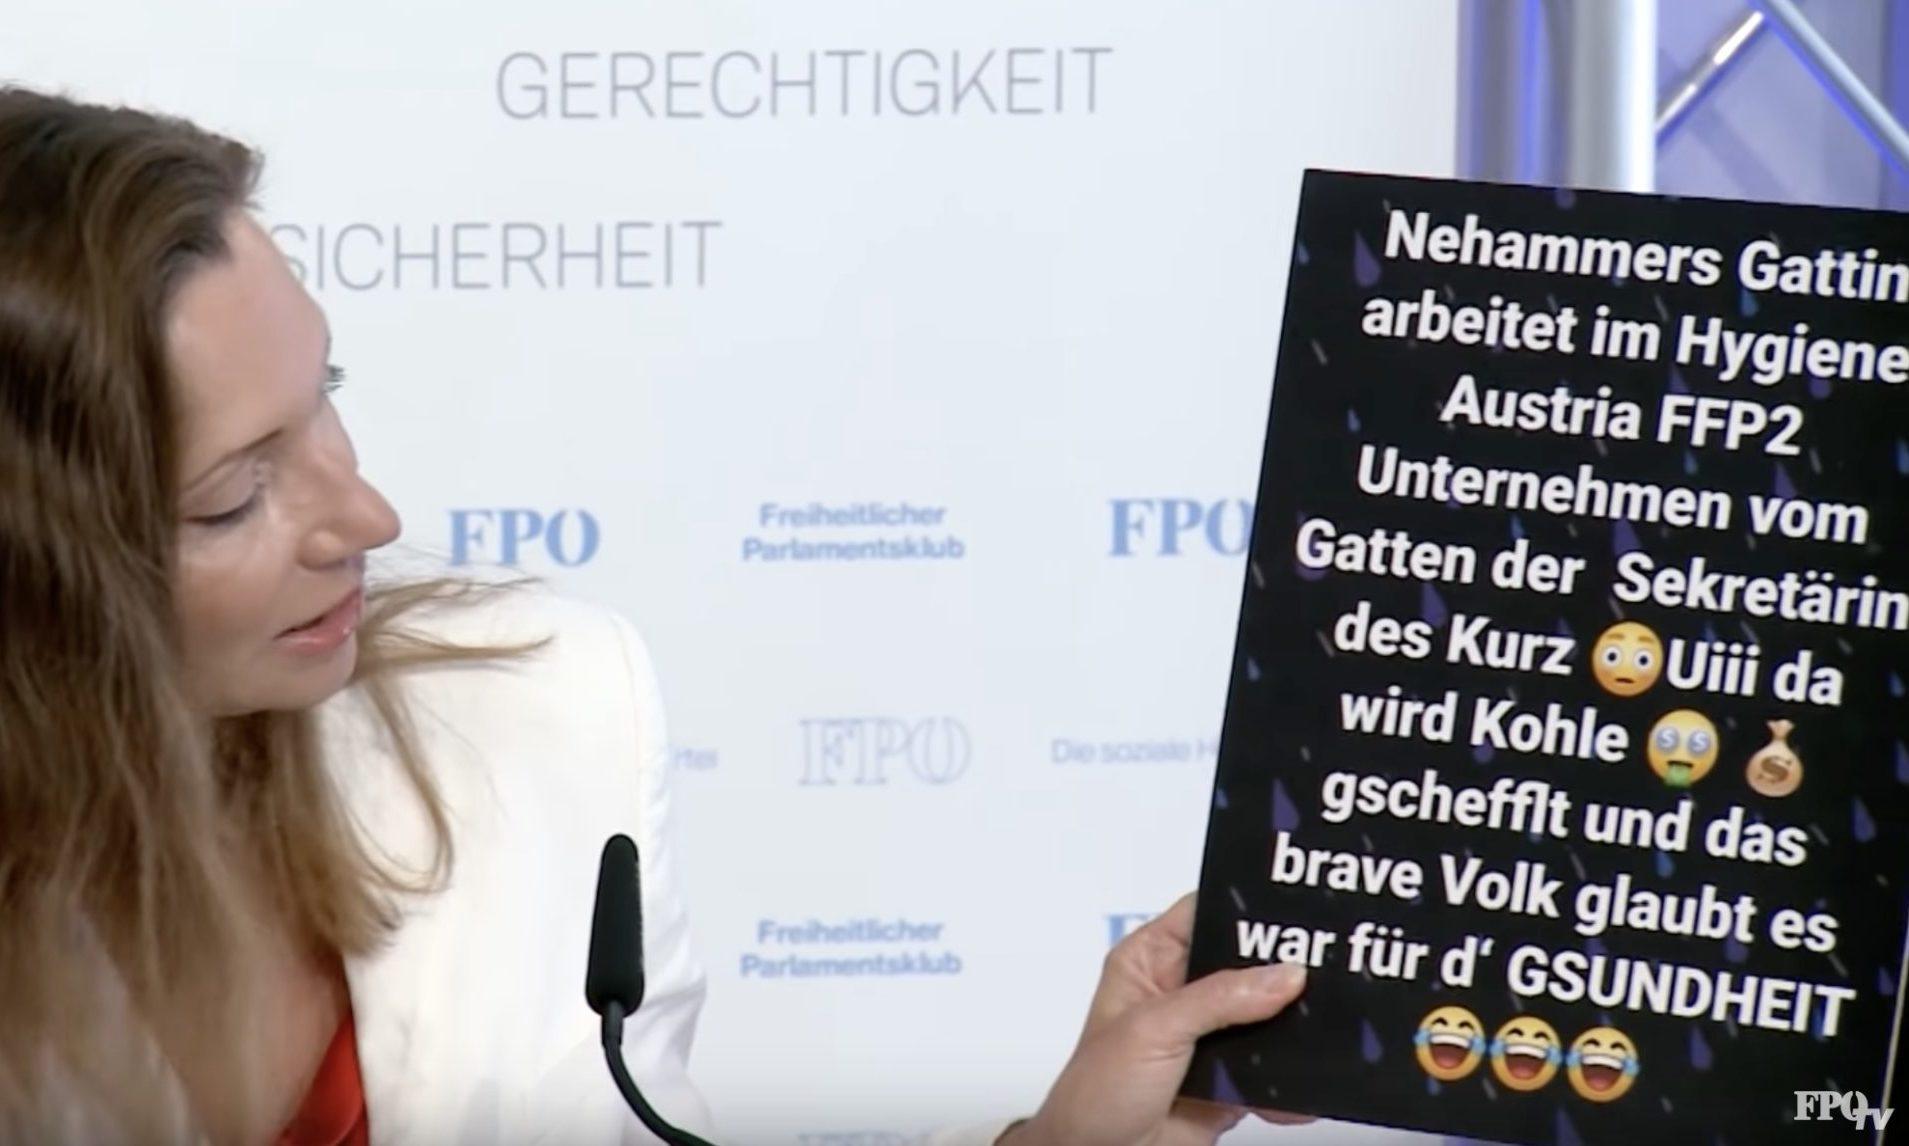 Fürst und Posting Katharina Nehammer